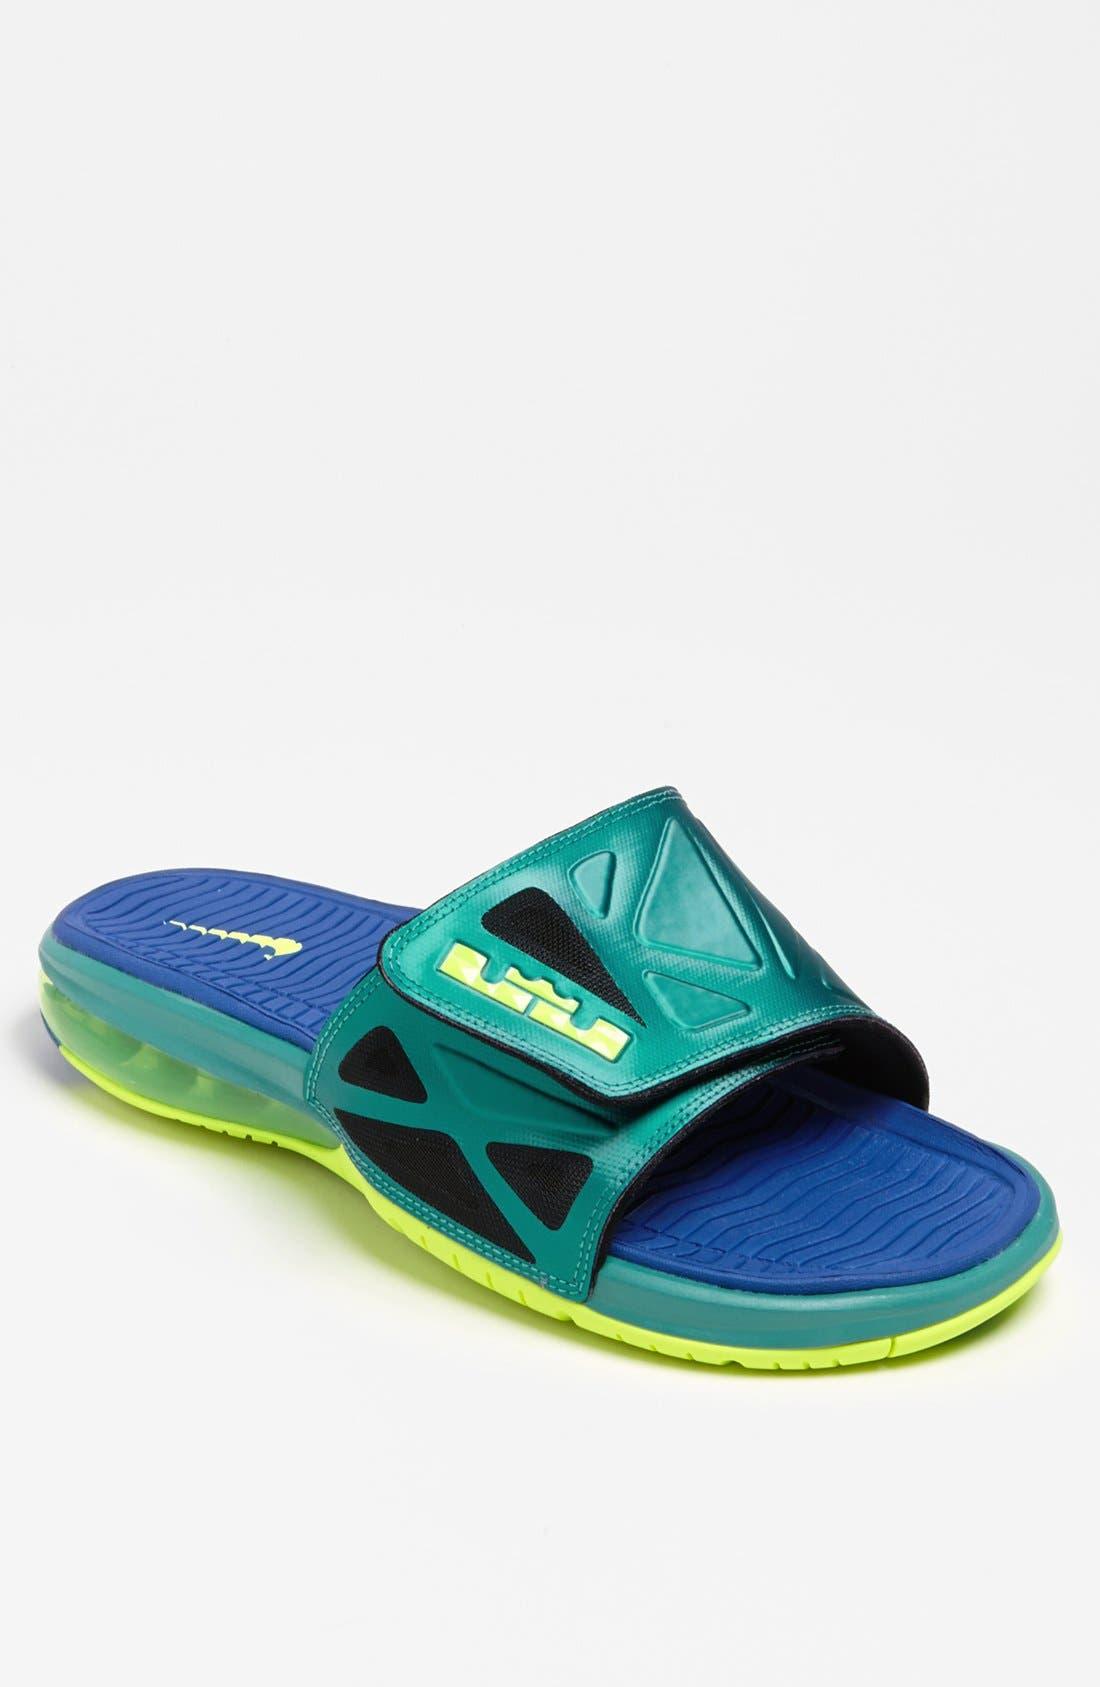 Alternate Image 1 Selected - Nike 'Air LeBron 2 Slide Elite' Sandal (Men)